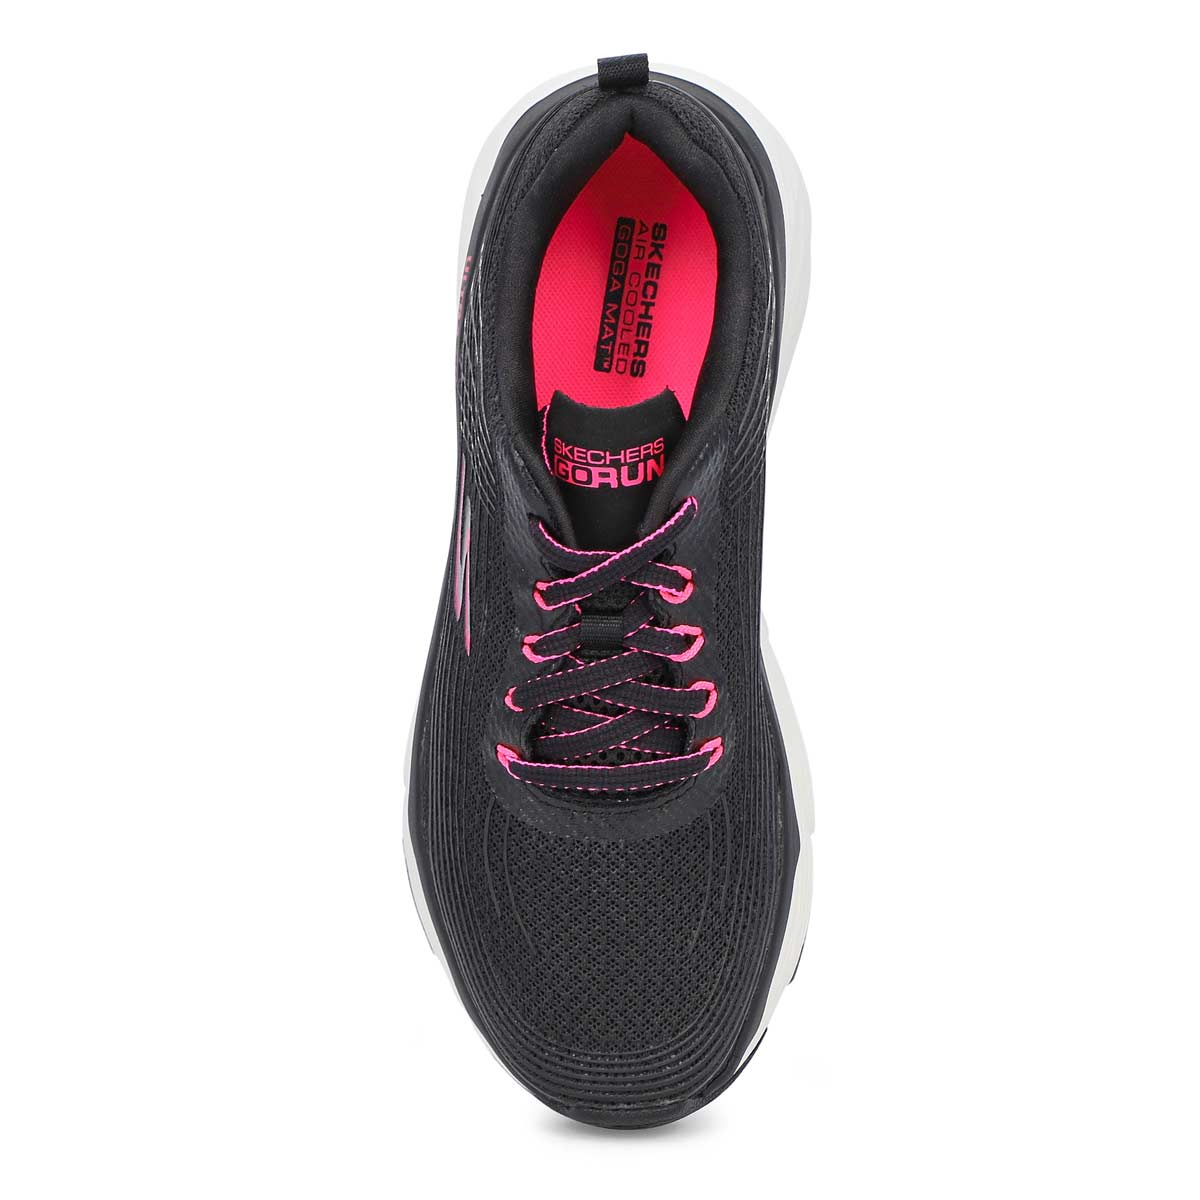 Women's Max Cushion Elite Running Shoe - Black